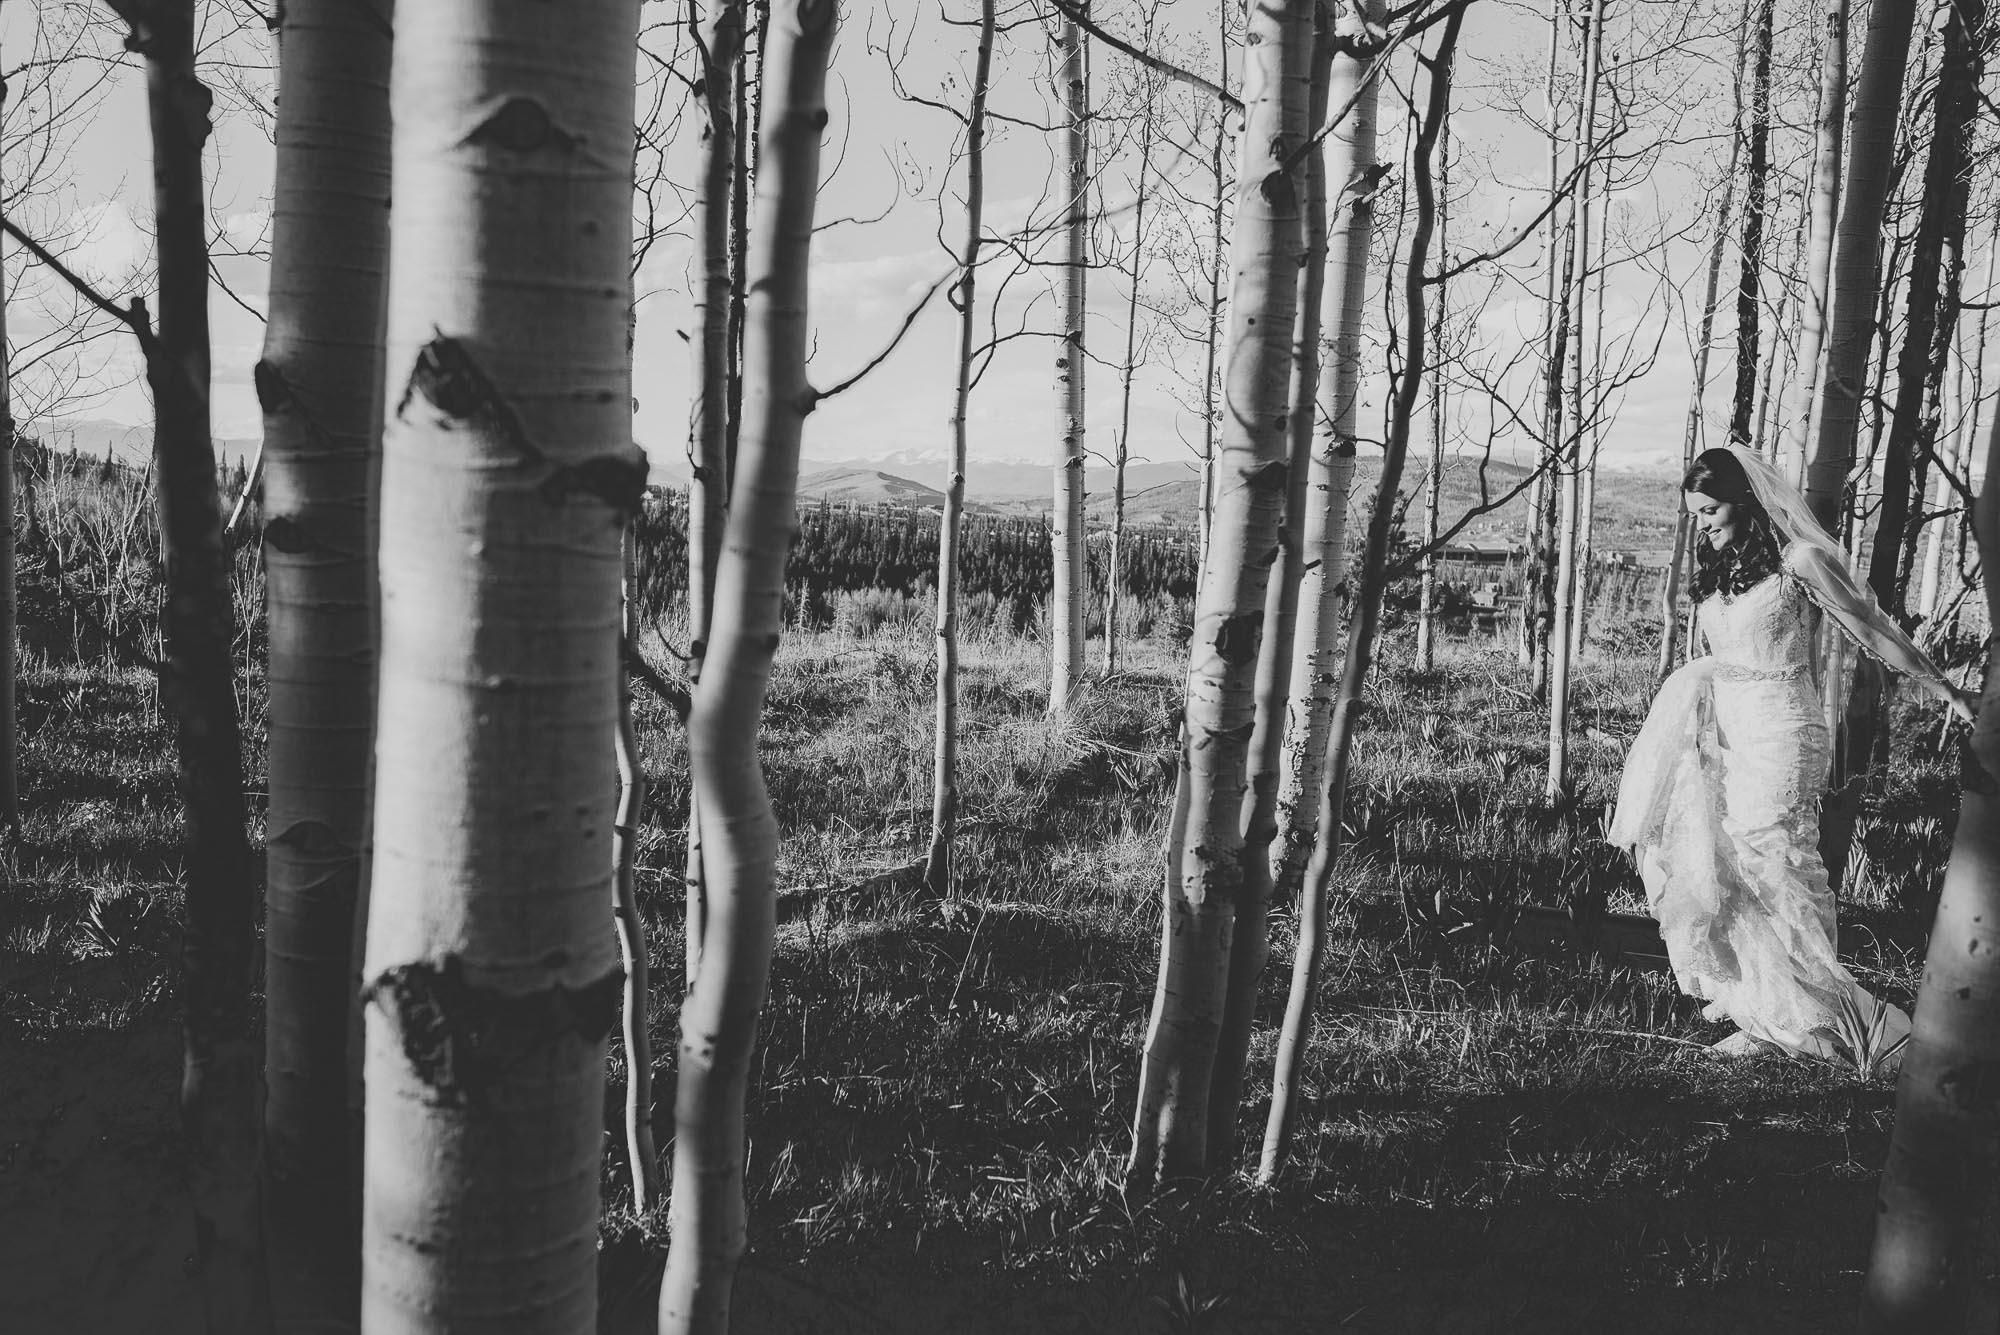 139elopement-photographer-colorado-119snow_mountain_ranch_wedding_colorado_wedding_photographer_kara&jason_1169_vintage_black_and_white_film.jpg